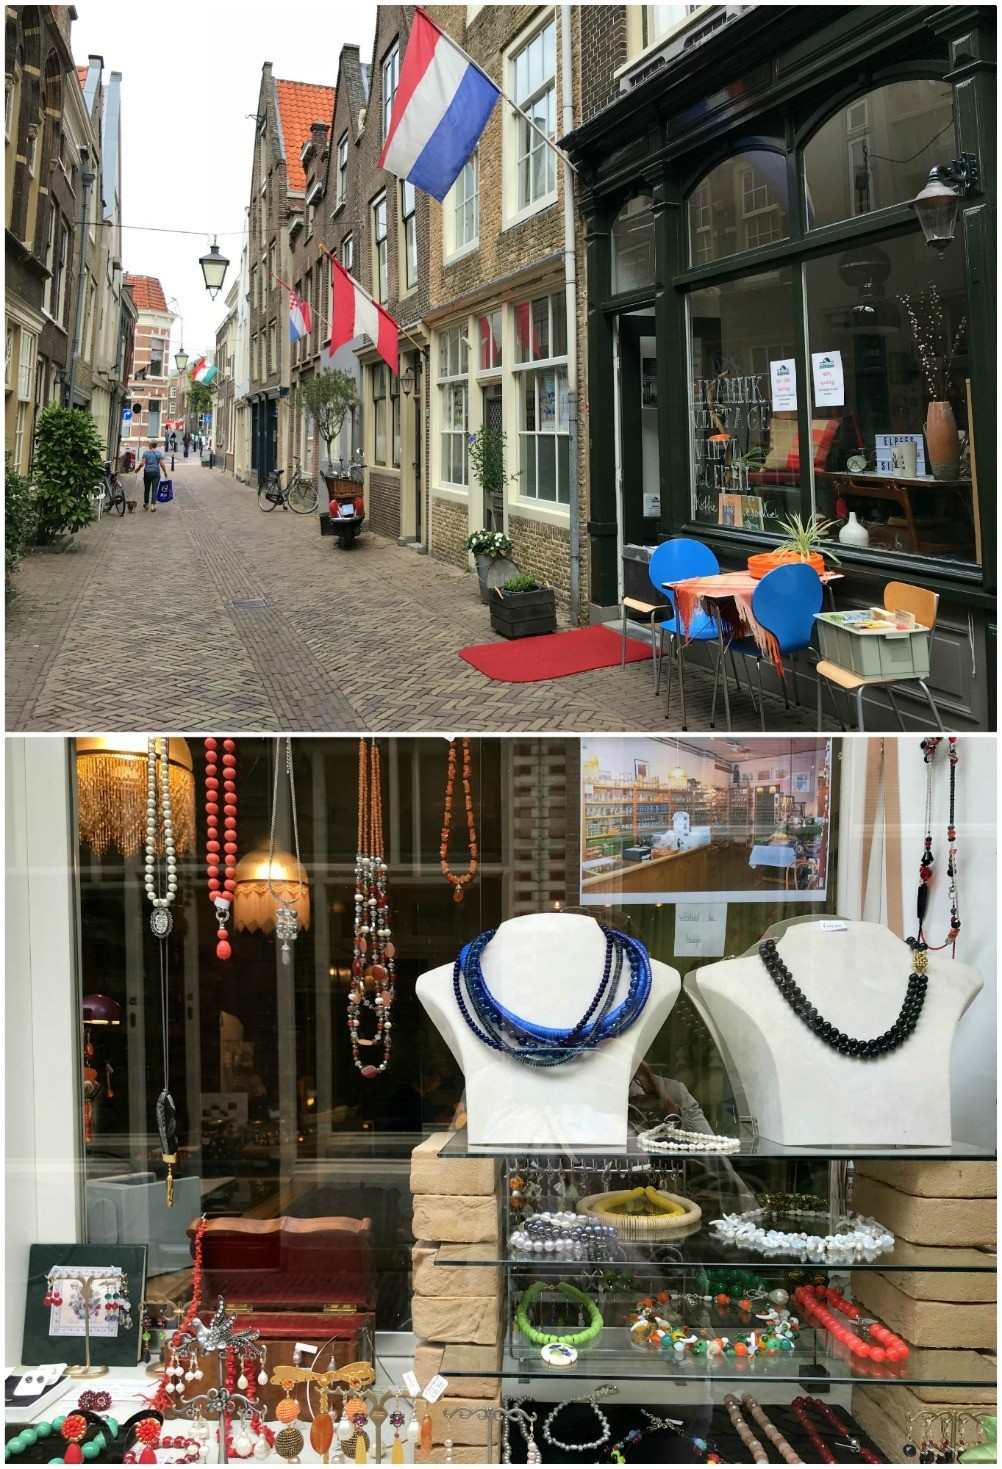 Vintage shops in Dordrecht, Netherlands Photo Heatheronhertravels.com